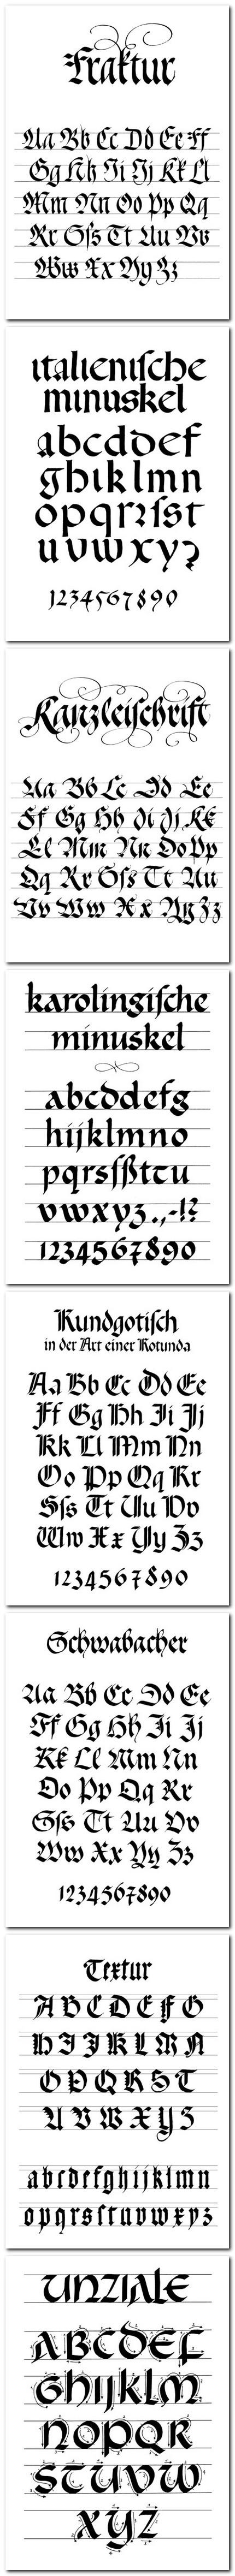 Matthias Groeschke plansele 2